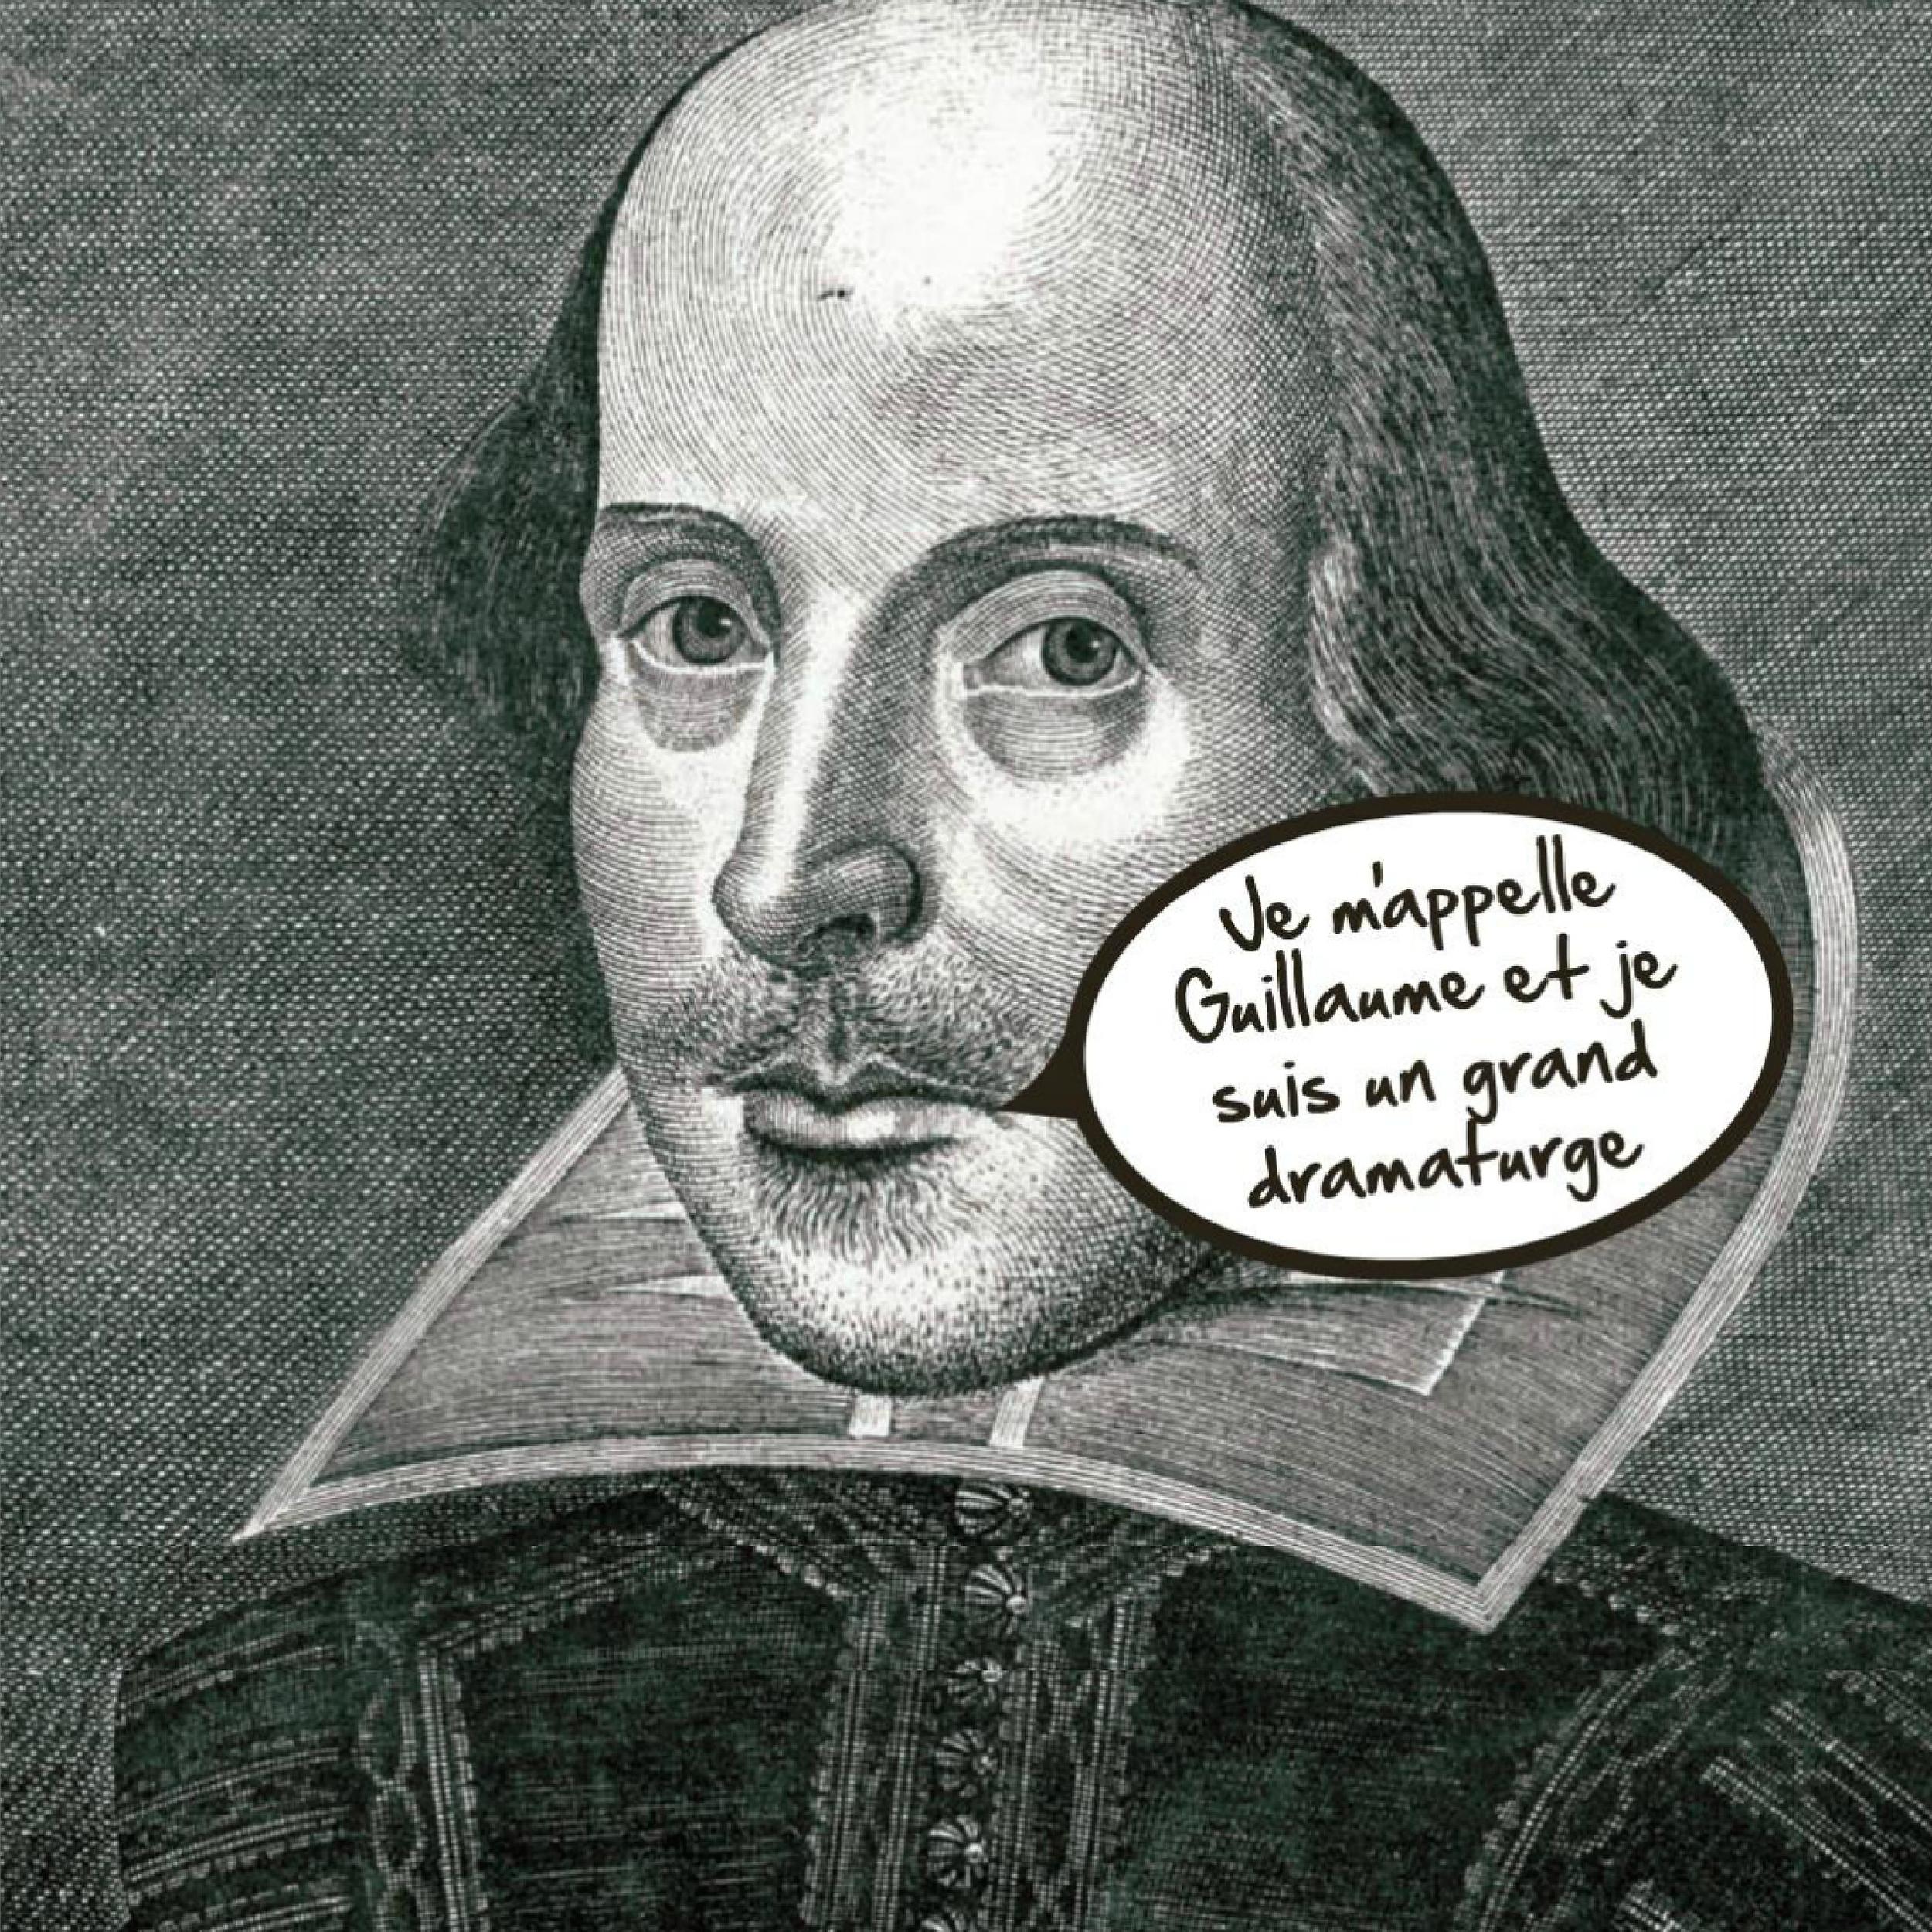 Shakespeare feature, Metropolitan